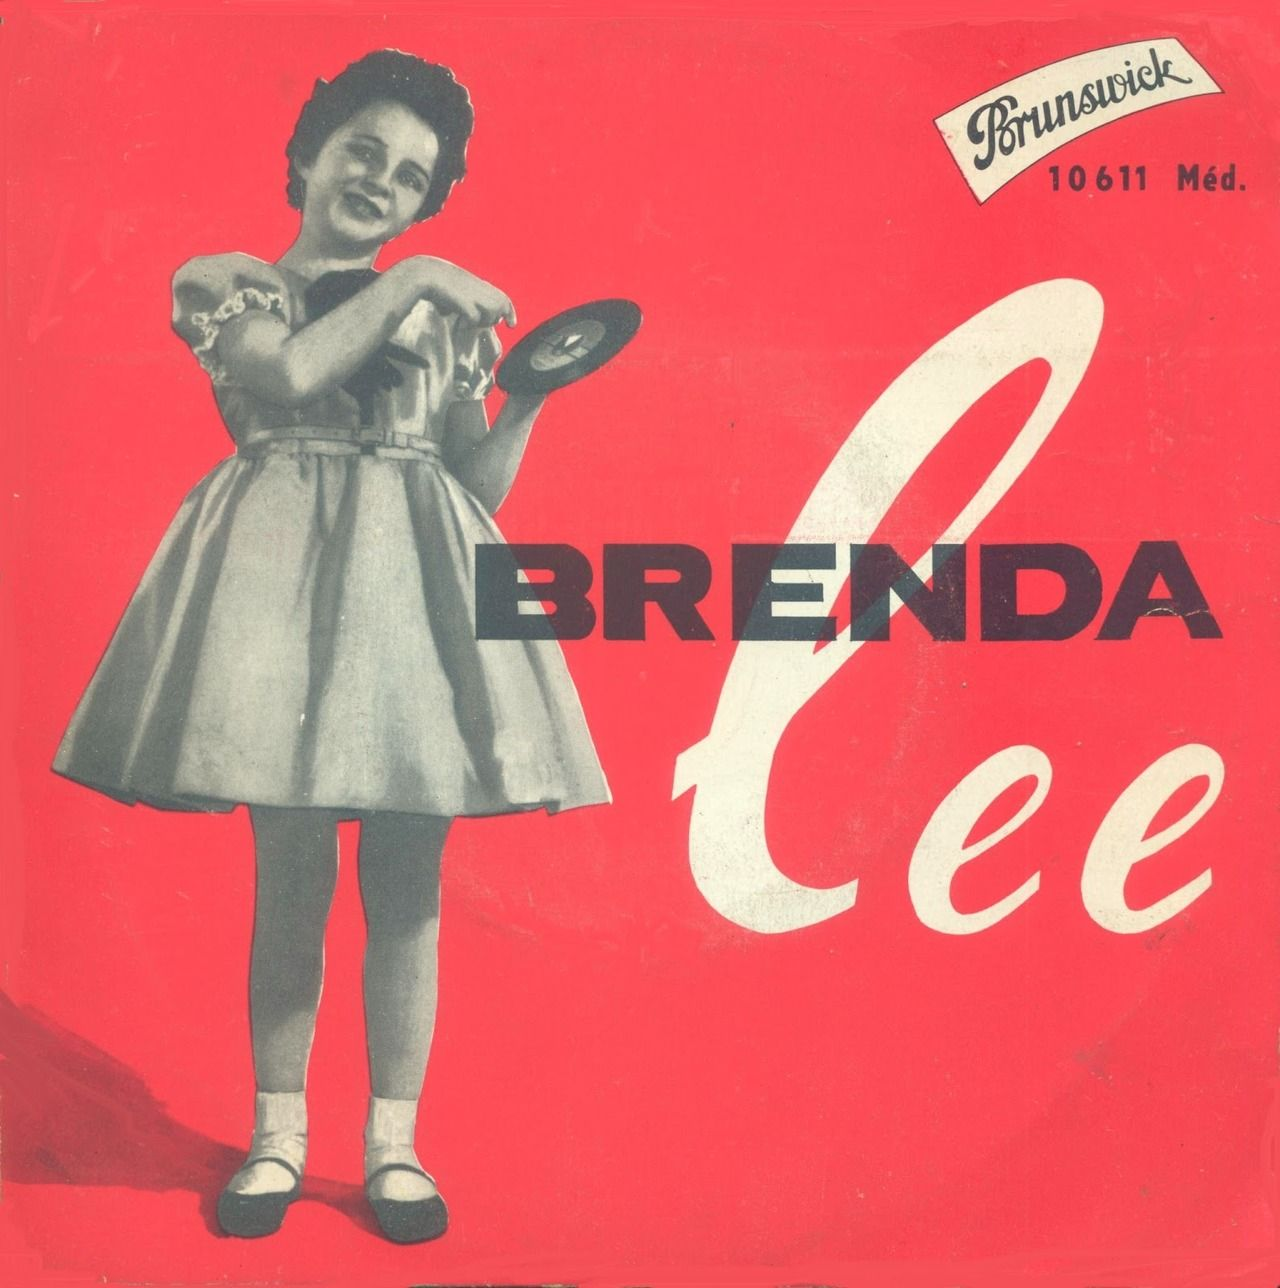 BOOGIE CHILDREN — Brenda Lee Album cover art, Lp cover